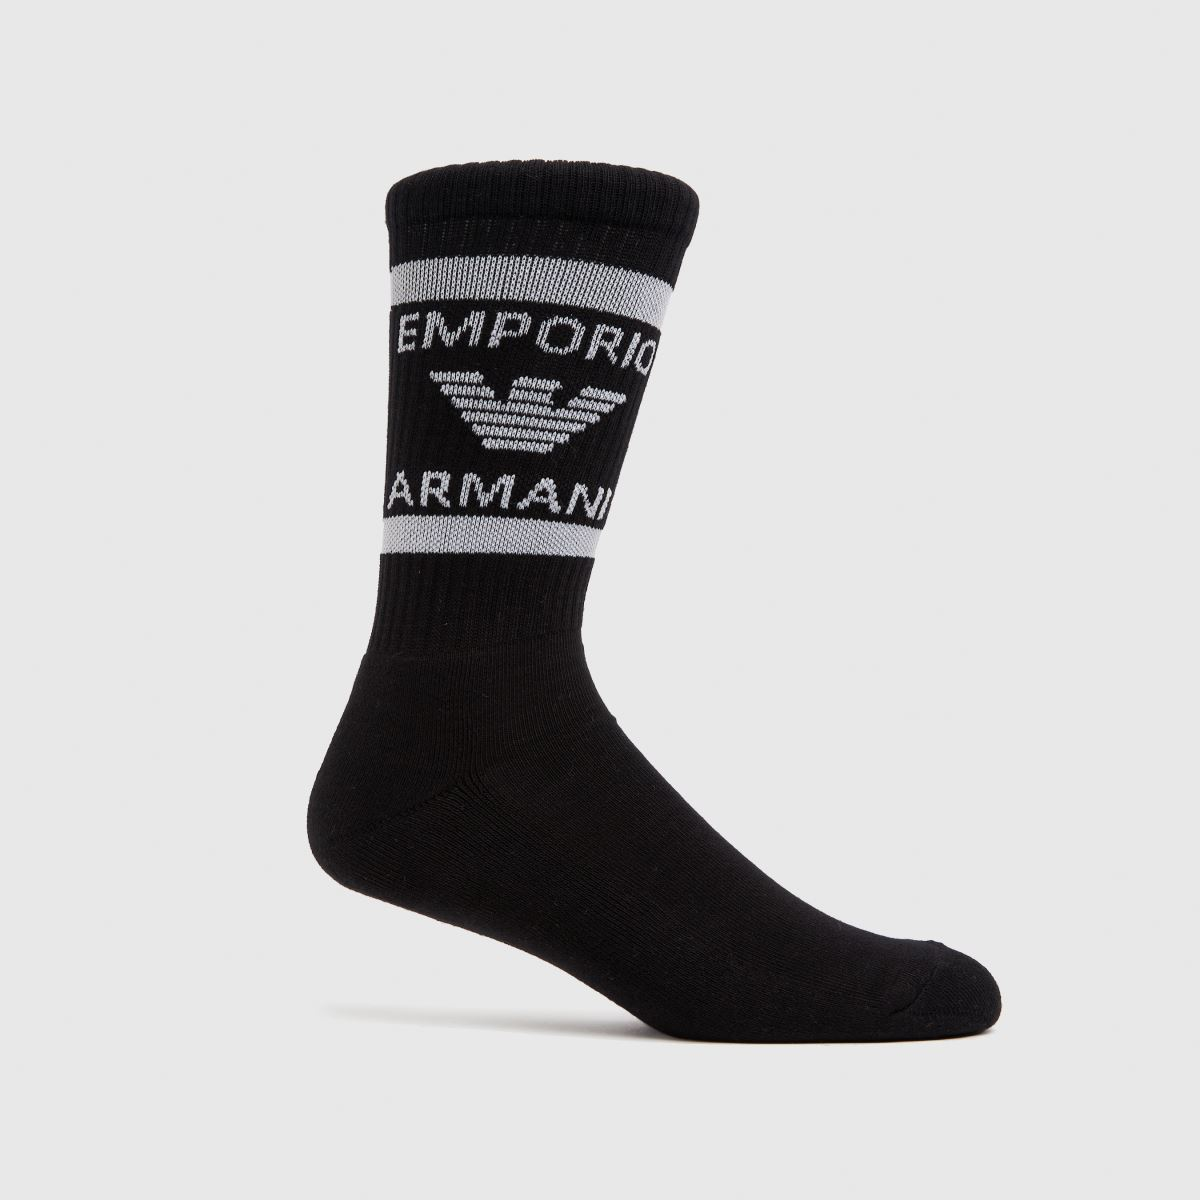 ARMANI Black 2 Pack Short Socks